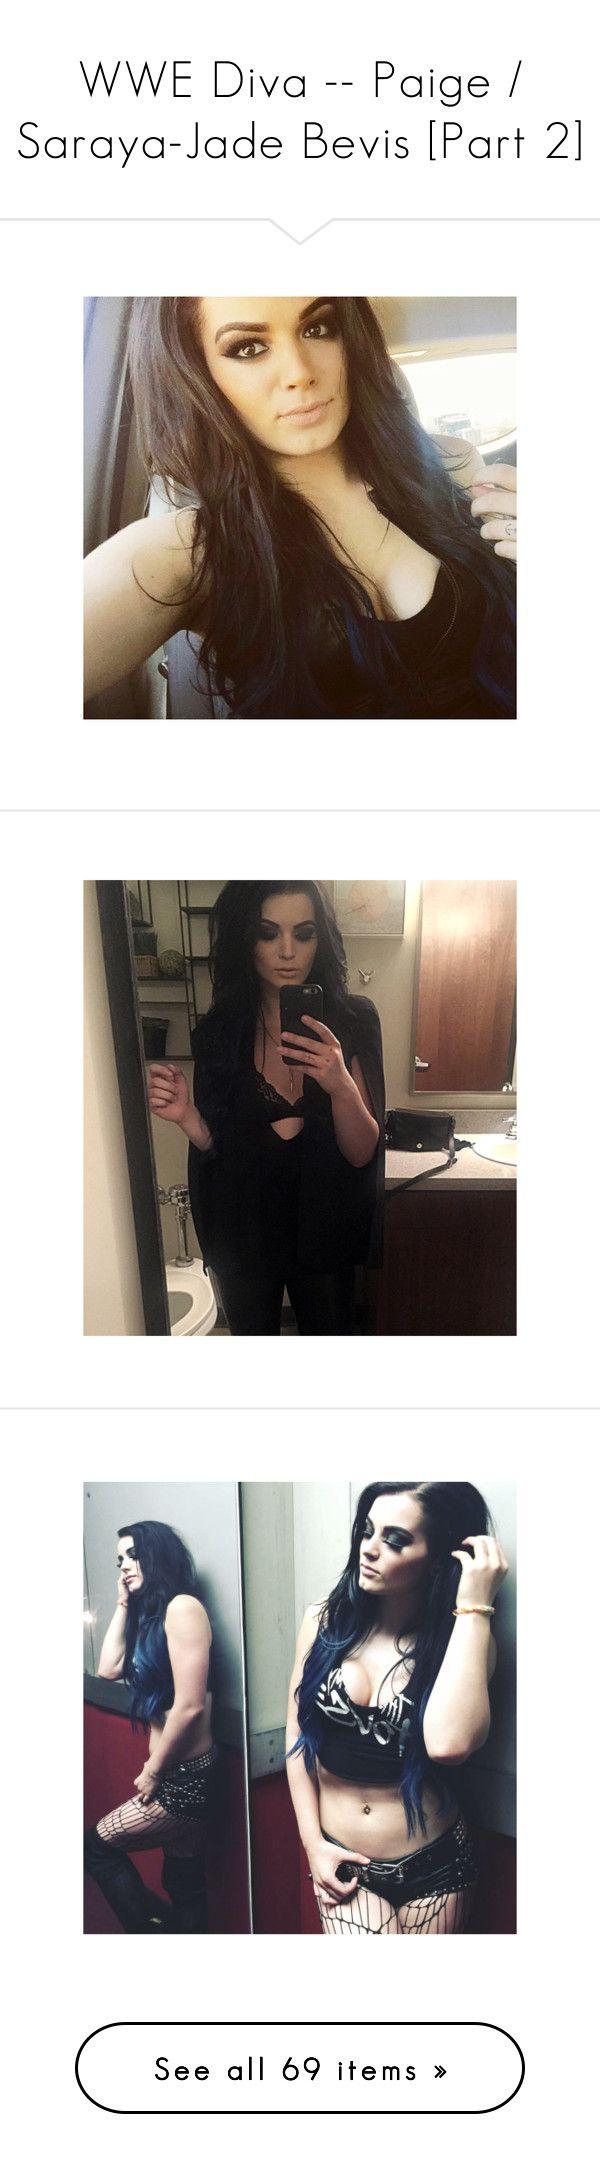 """WWE Diva -- Paige / Saraya-Jade Bevis [Part 2]"" by sarahstardom ❤ liked on Polyvore featuring paige"